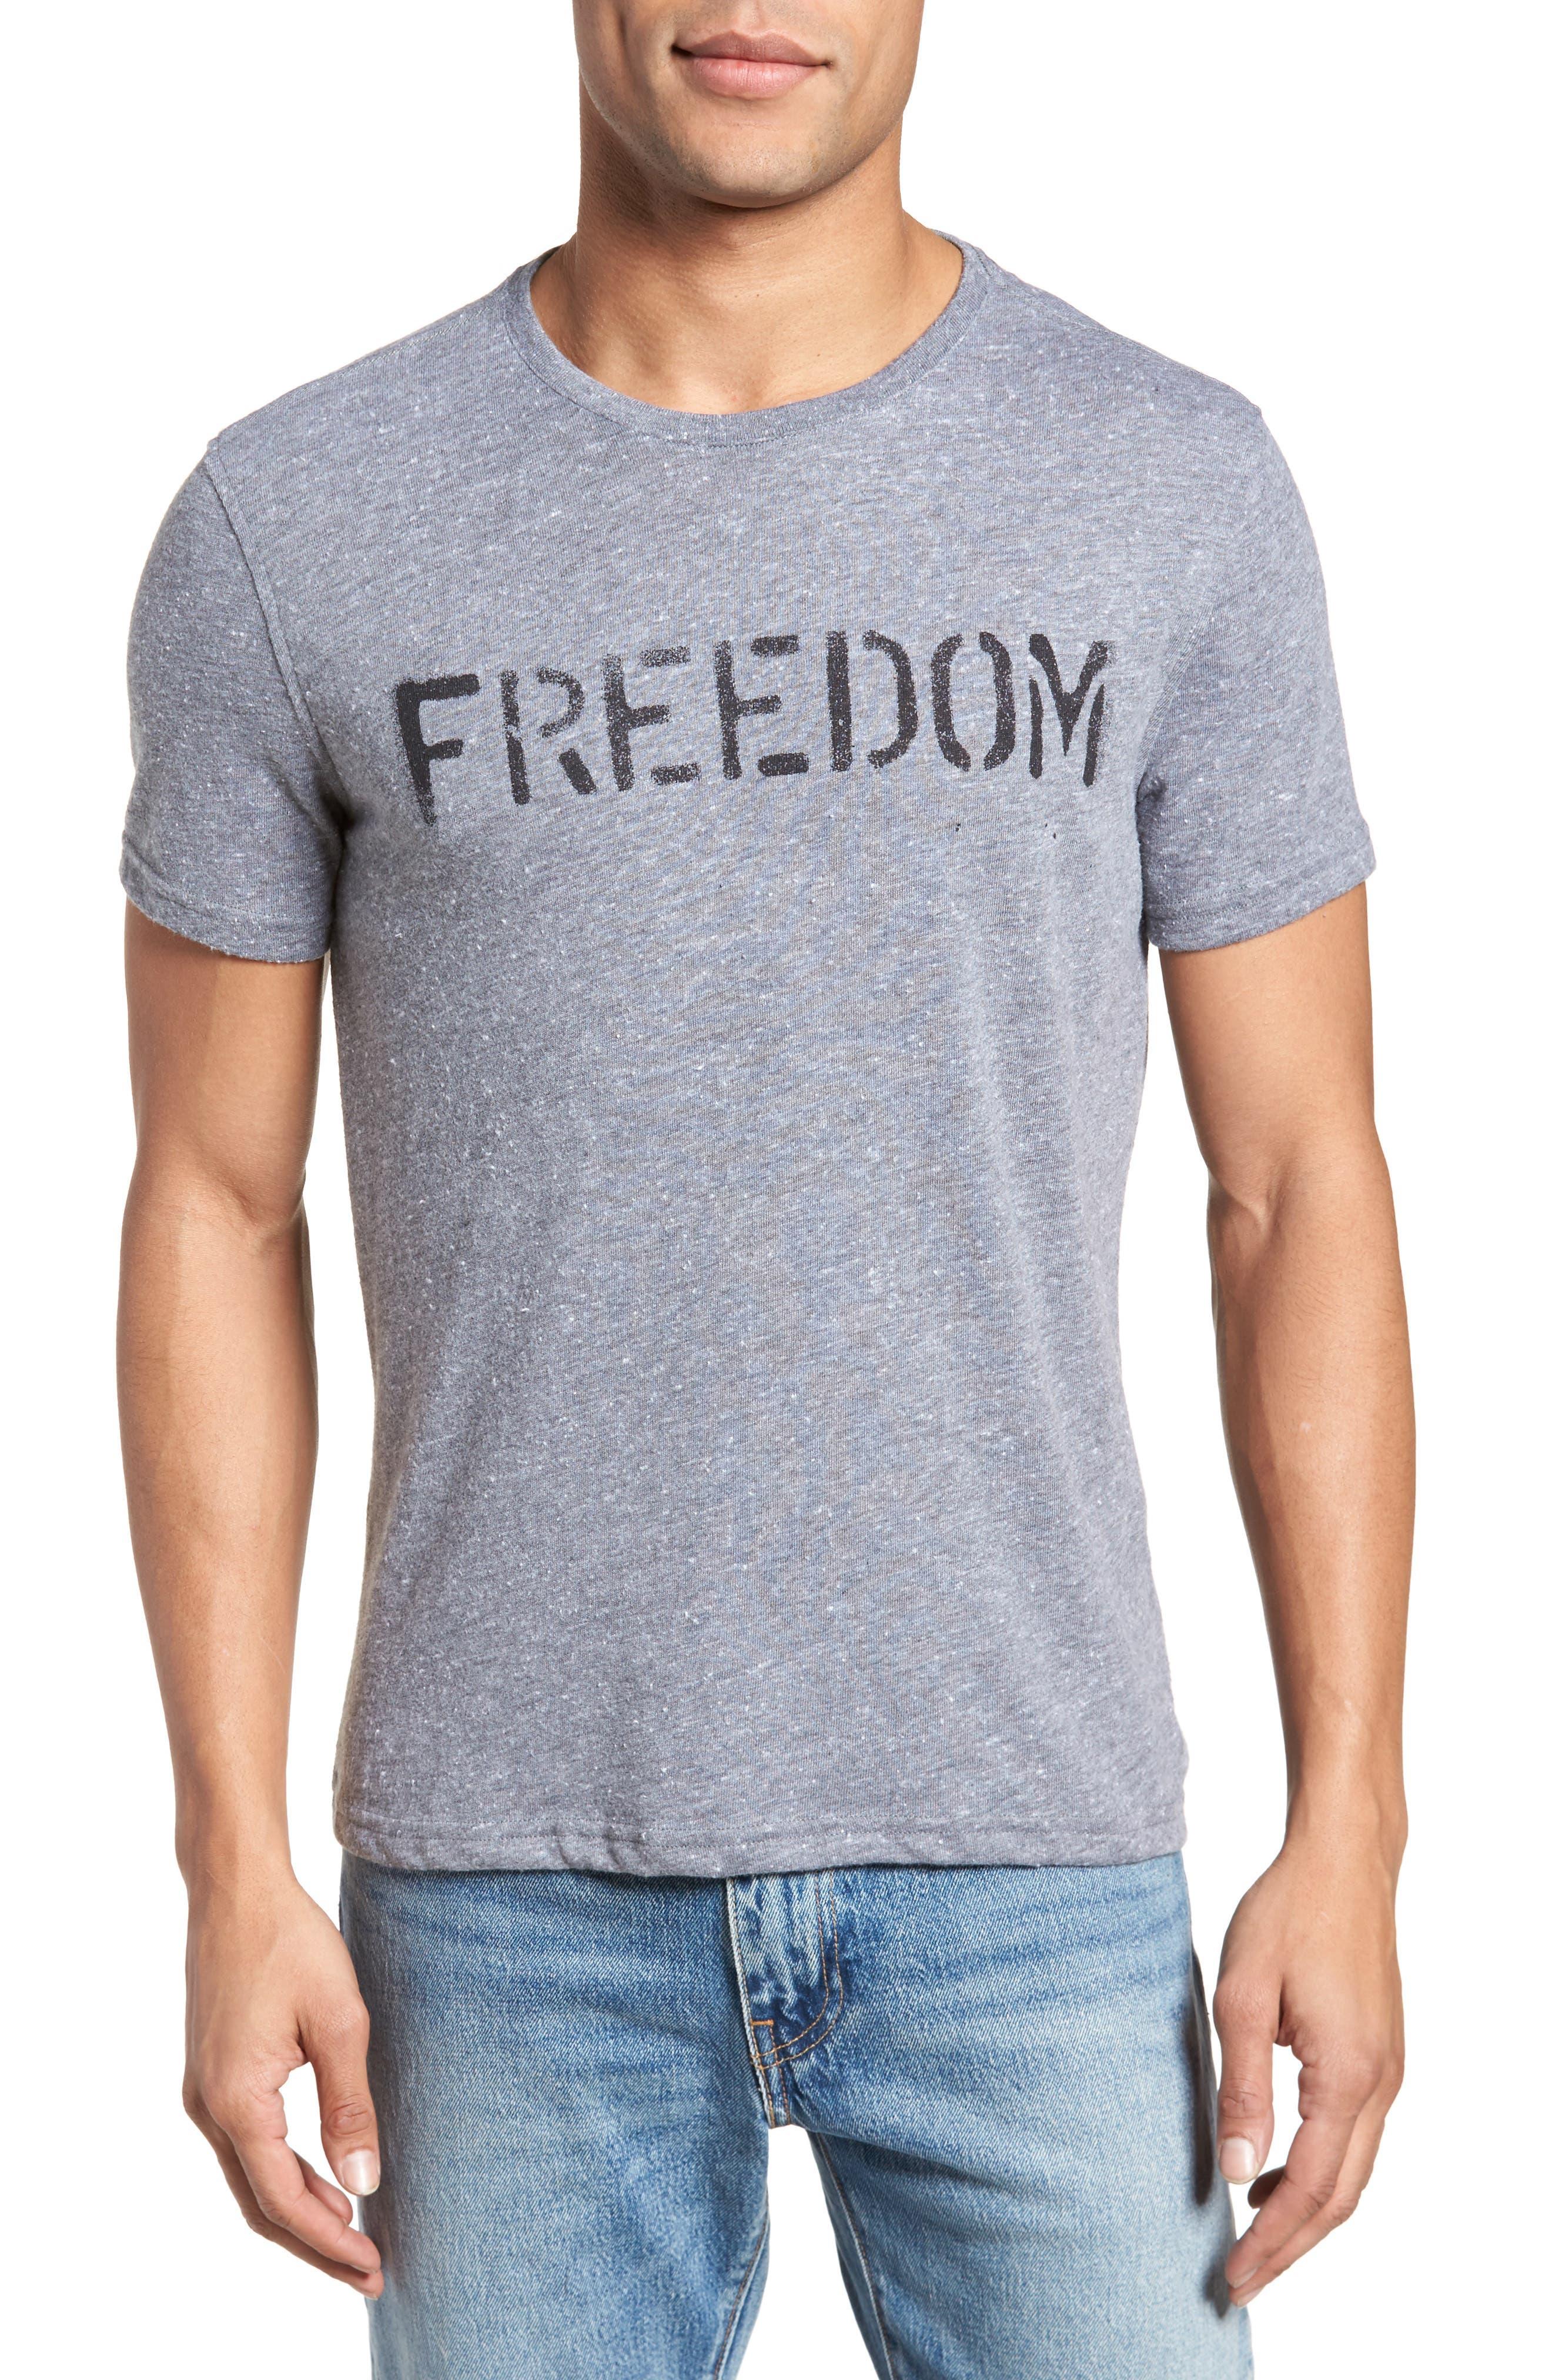 Freedom Graphic T-Shirt,                             Main thumbnail 1, color,                             073